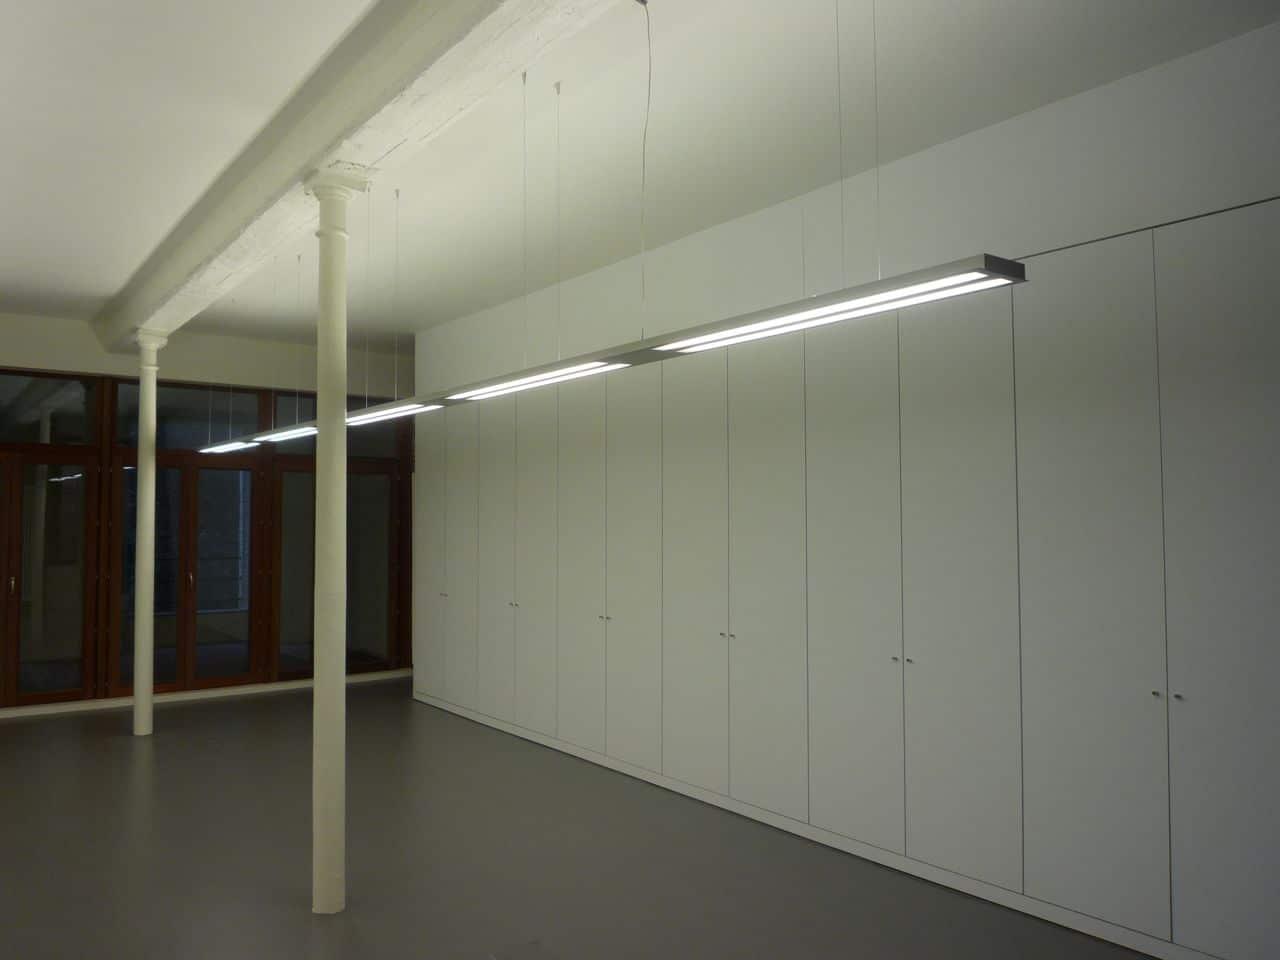 P1060701 | Baeyens & Beck architecten Gent | architect nieuwbouw renovatie interieur | high end | architectenbureau